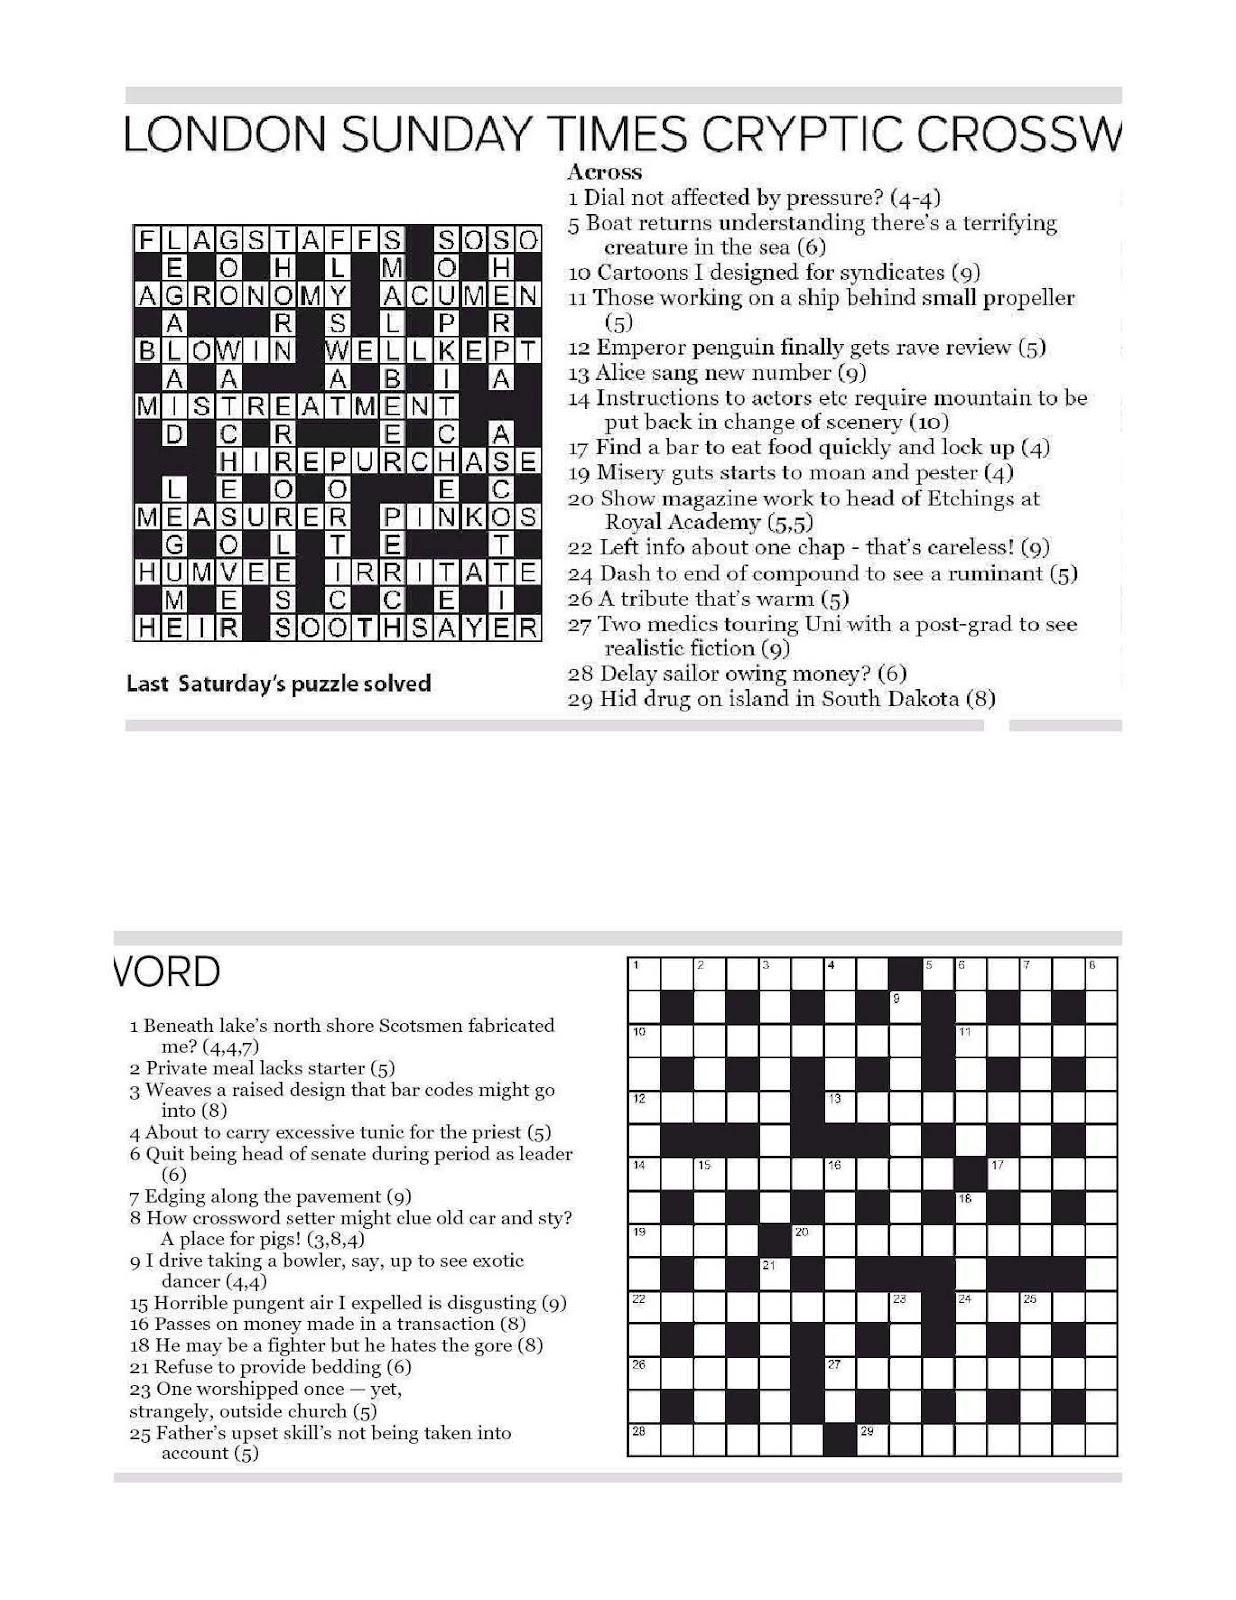 Ottawa Citizen Cryptic Crossword Forum: Sunday, August 5